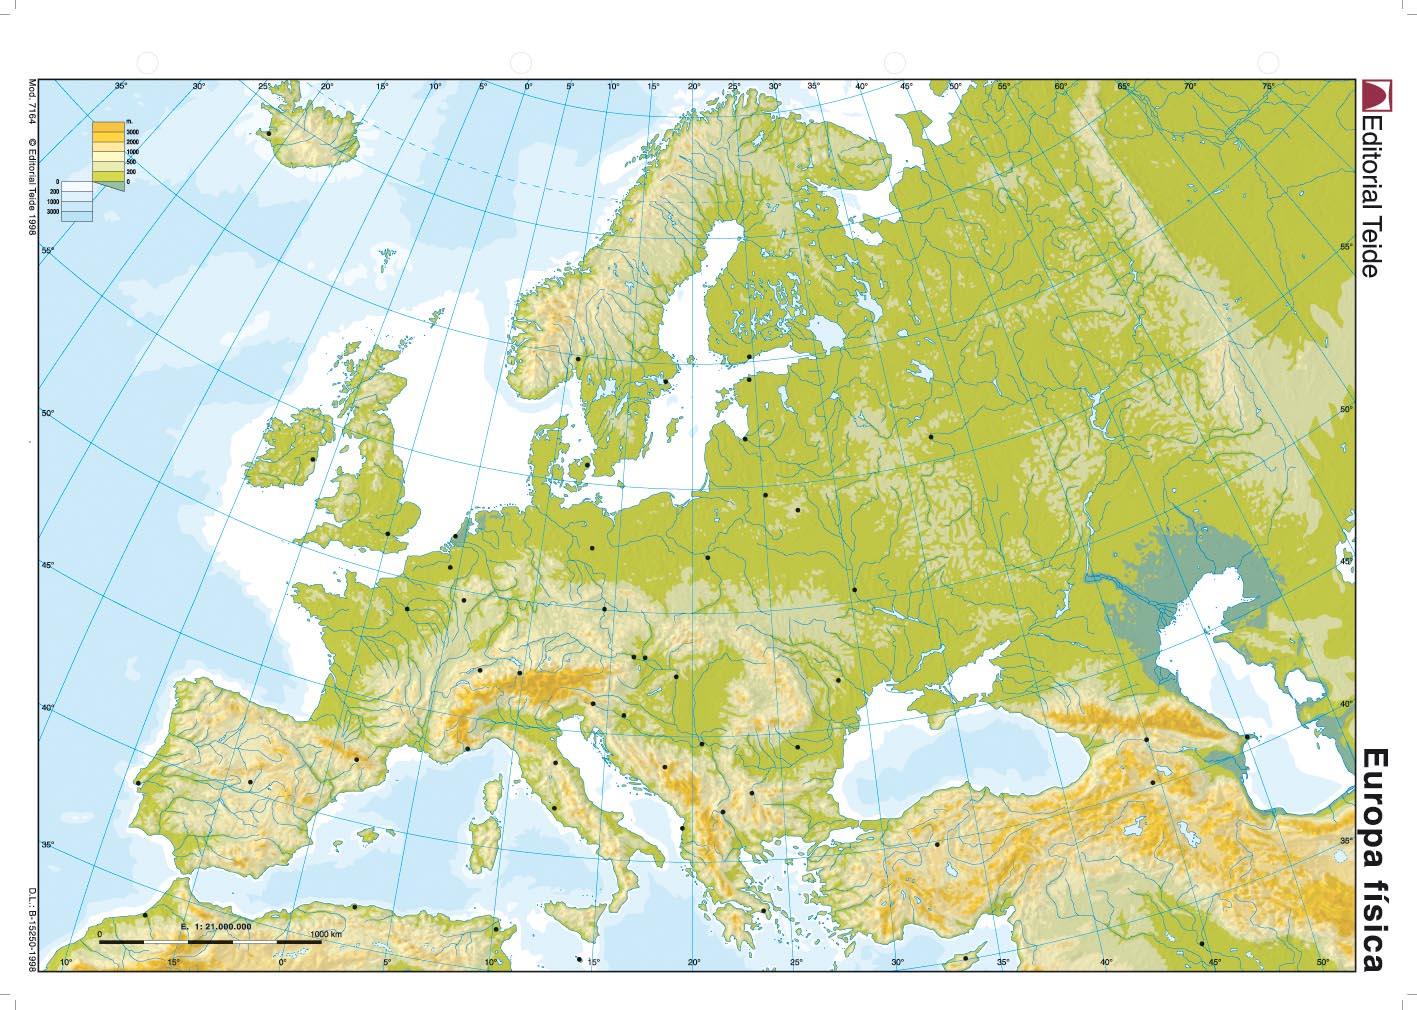 Mapa Mudo De Europa Politico.Juegos De Geografia Juego De Europa Fisica Mapa Mudo